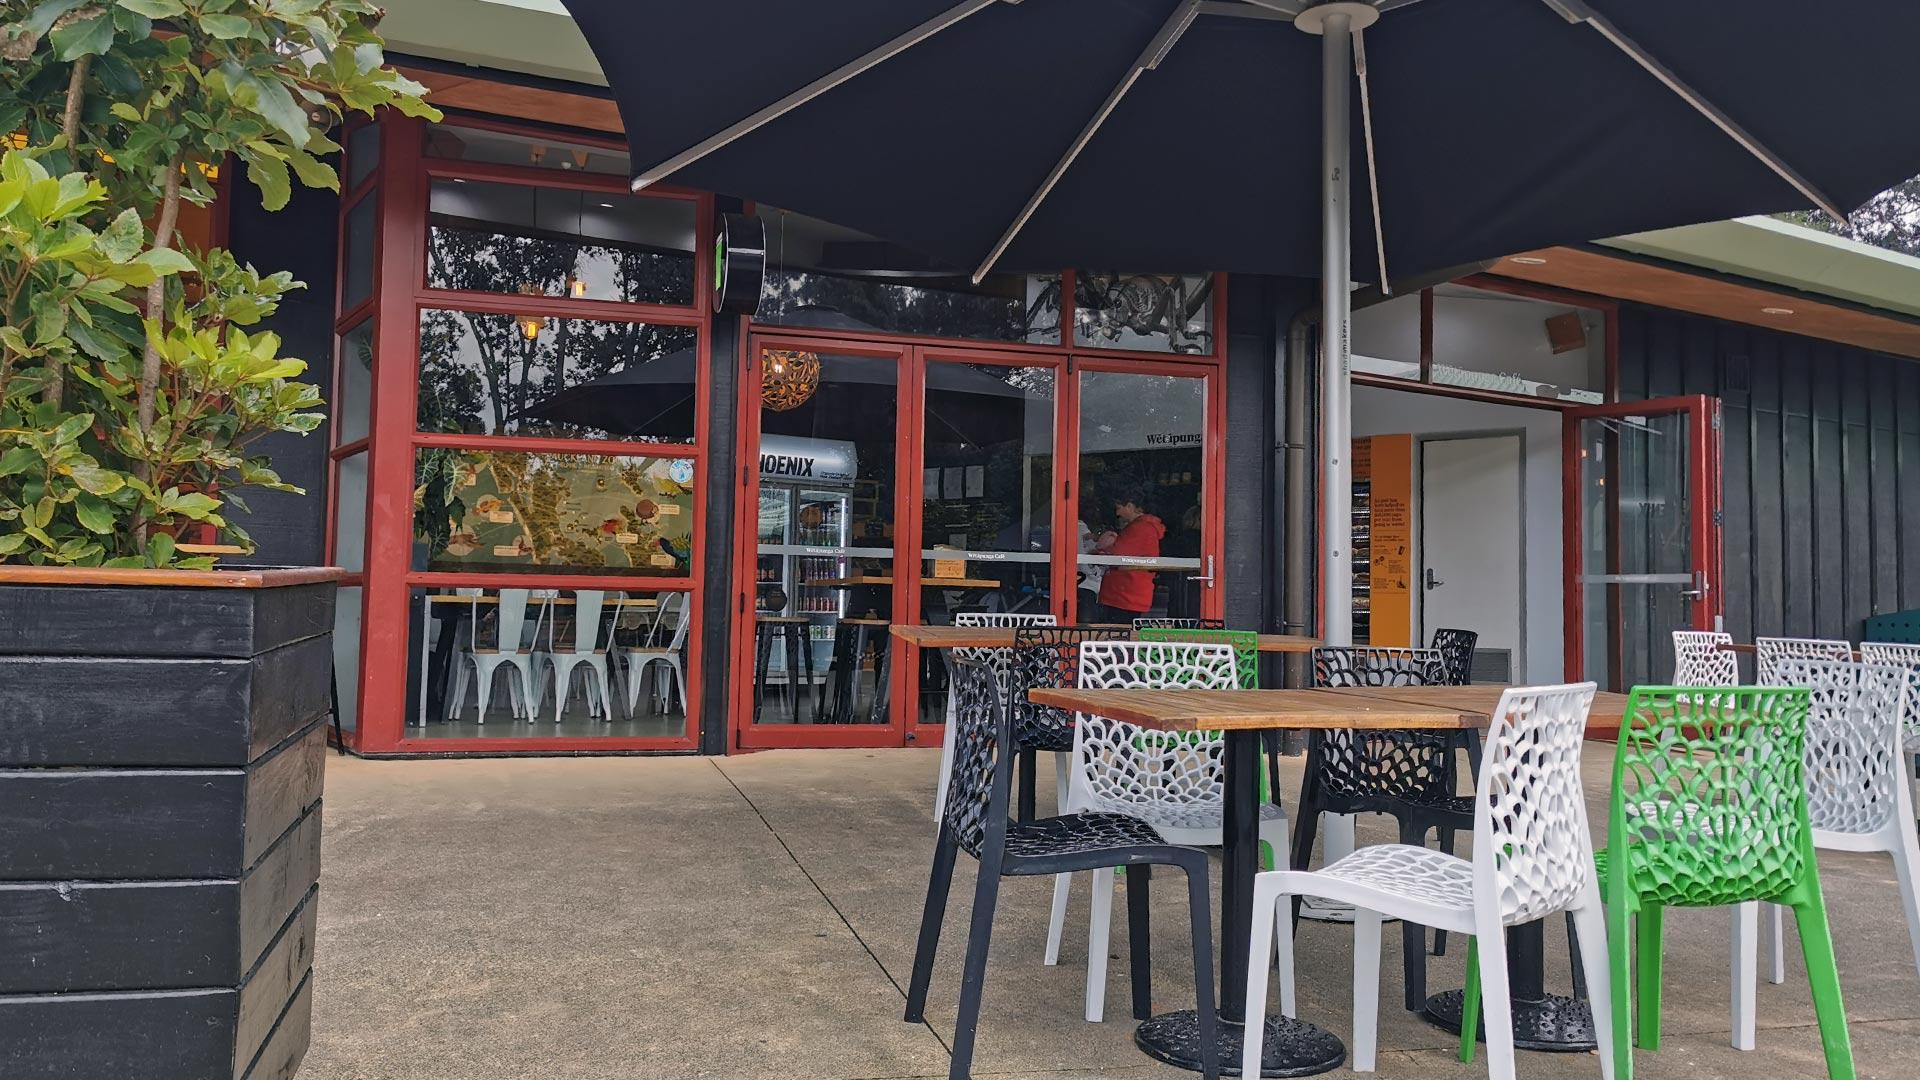 https://rfacdn.nz/zoo/assets/media/wetapunga-cafe-exterior-gallery.jpg